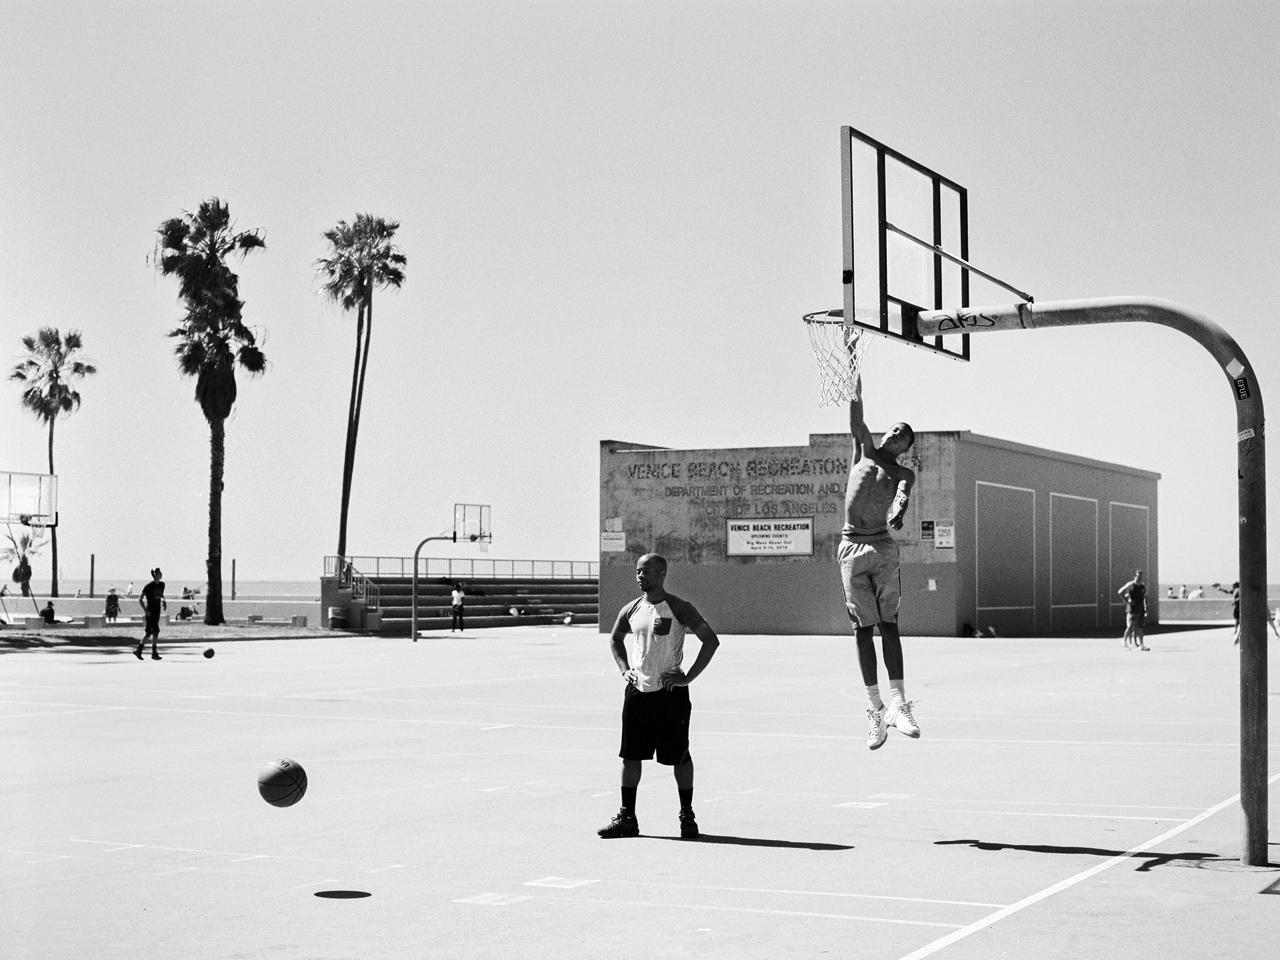 California_2016_Kodak_Tri-x_2_8.jpg